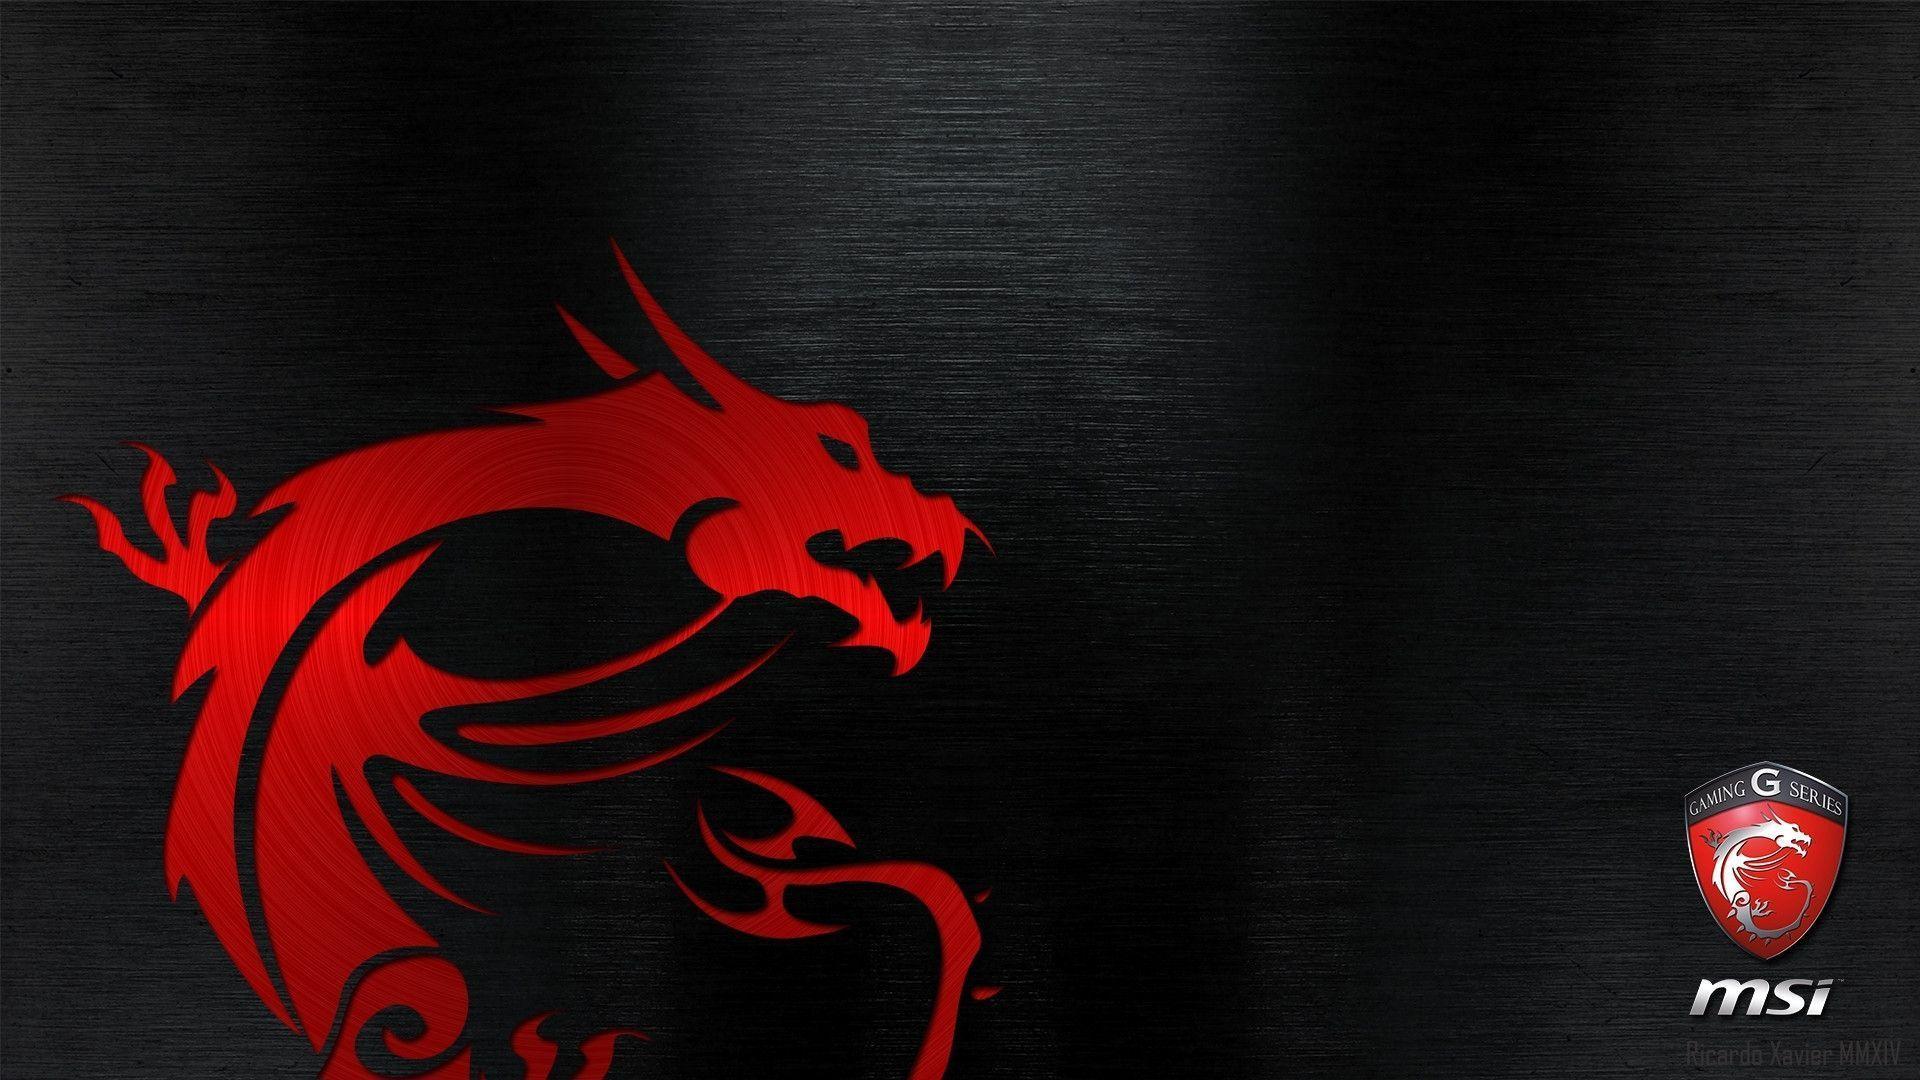 Redragon Wallpapers Top Free Redragon Backgrounds Wallpaperaccess